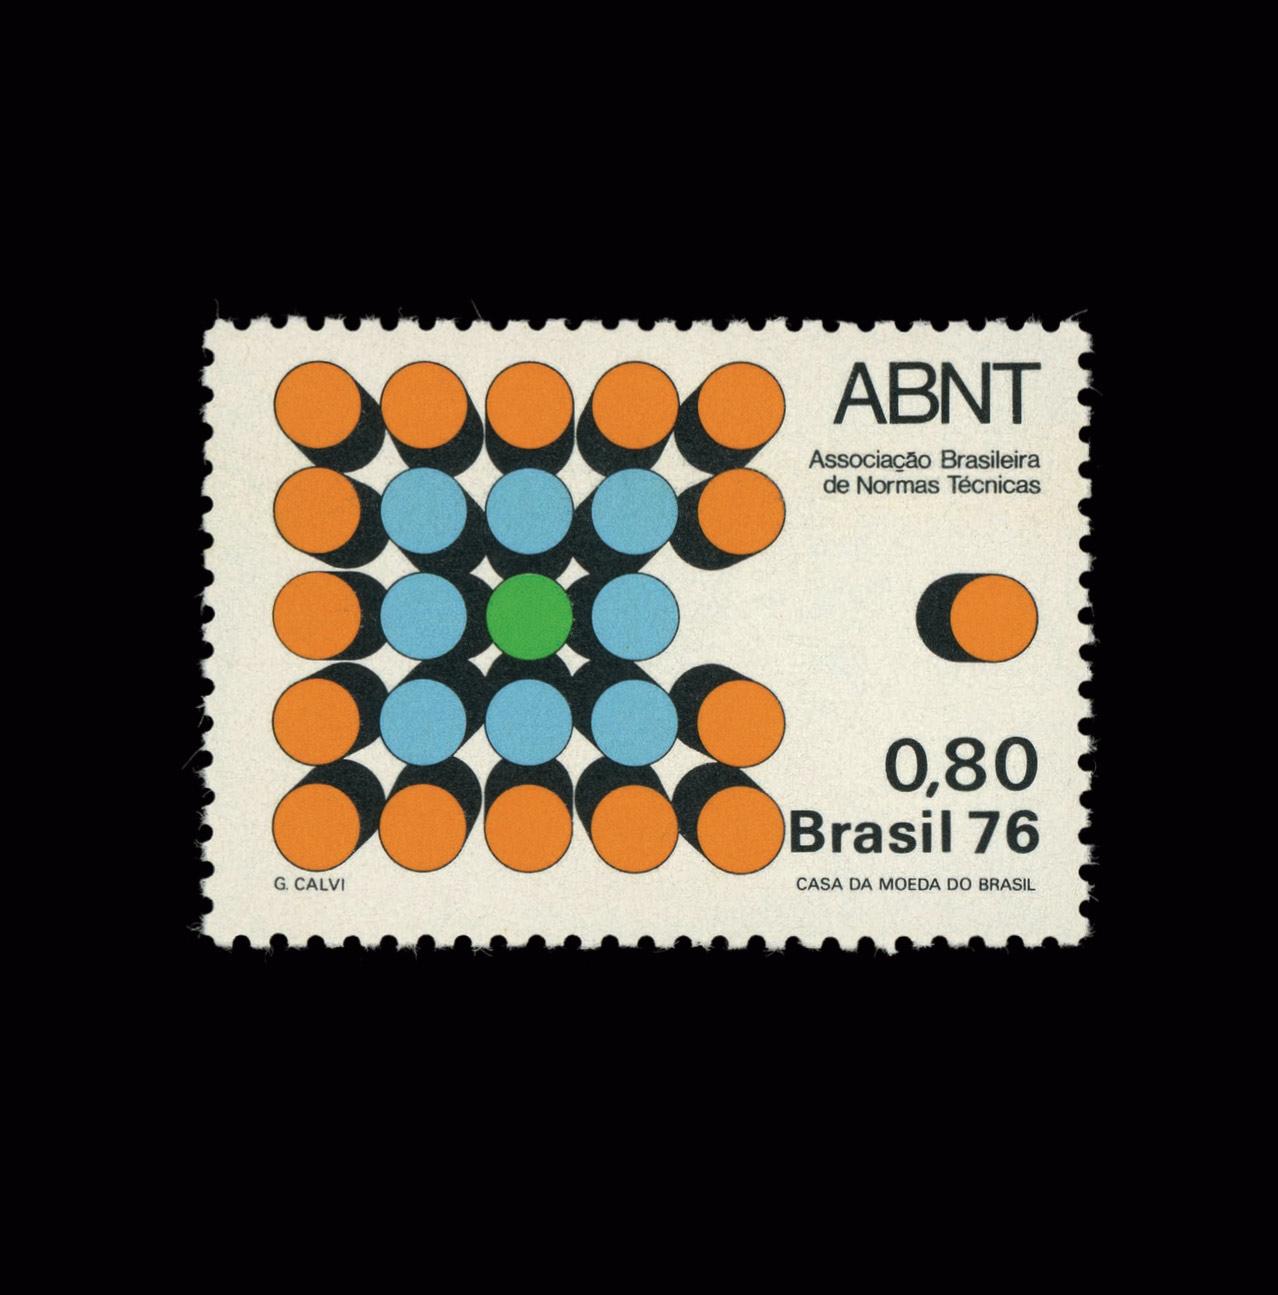 Brasilien 1976 von Gian Calvi